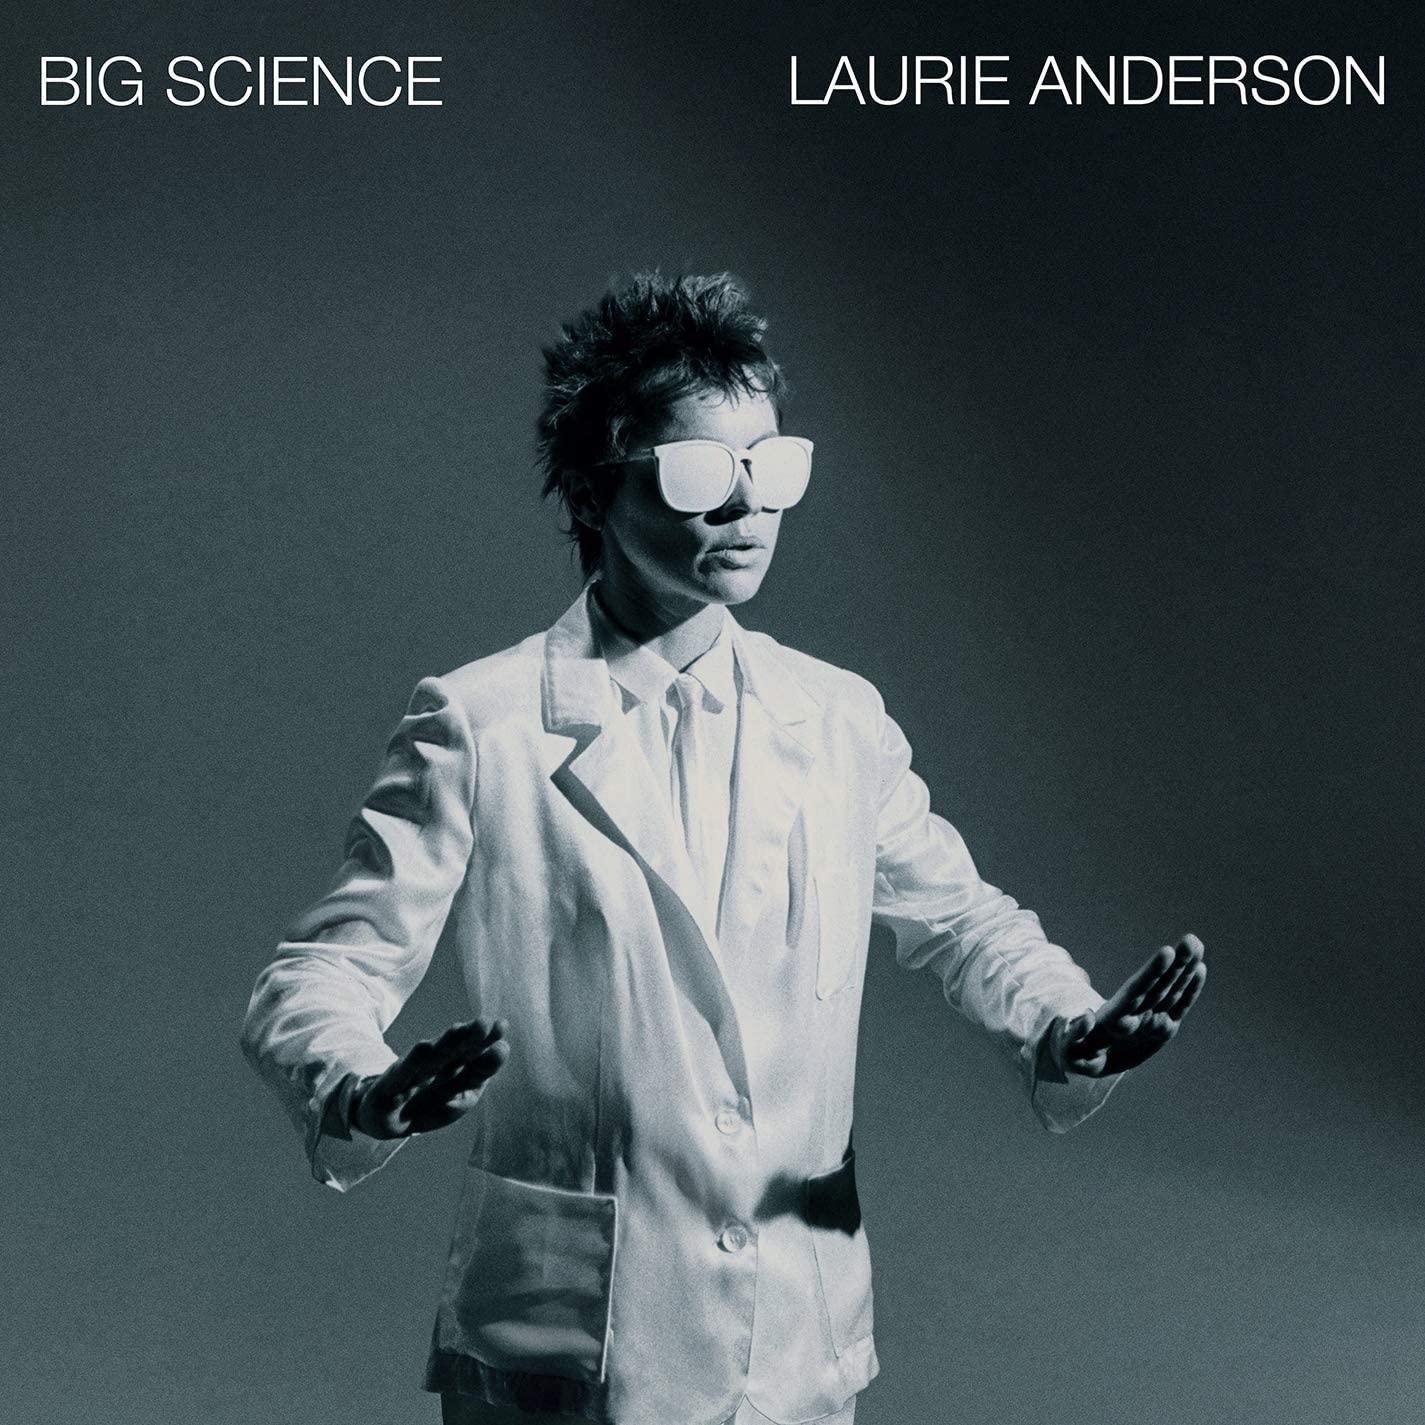 Copertina Vinile 33 giri Big Science di Laurie Anderson